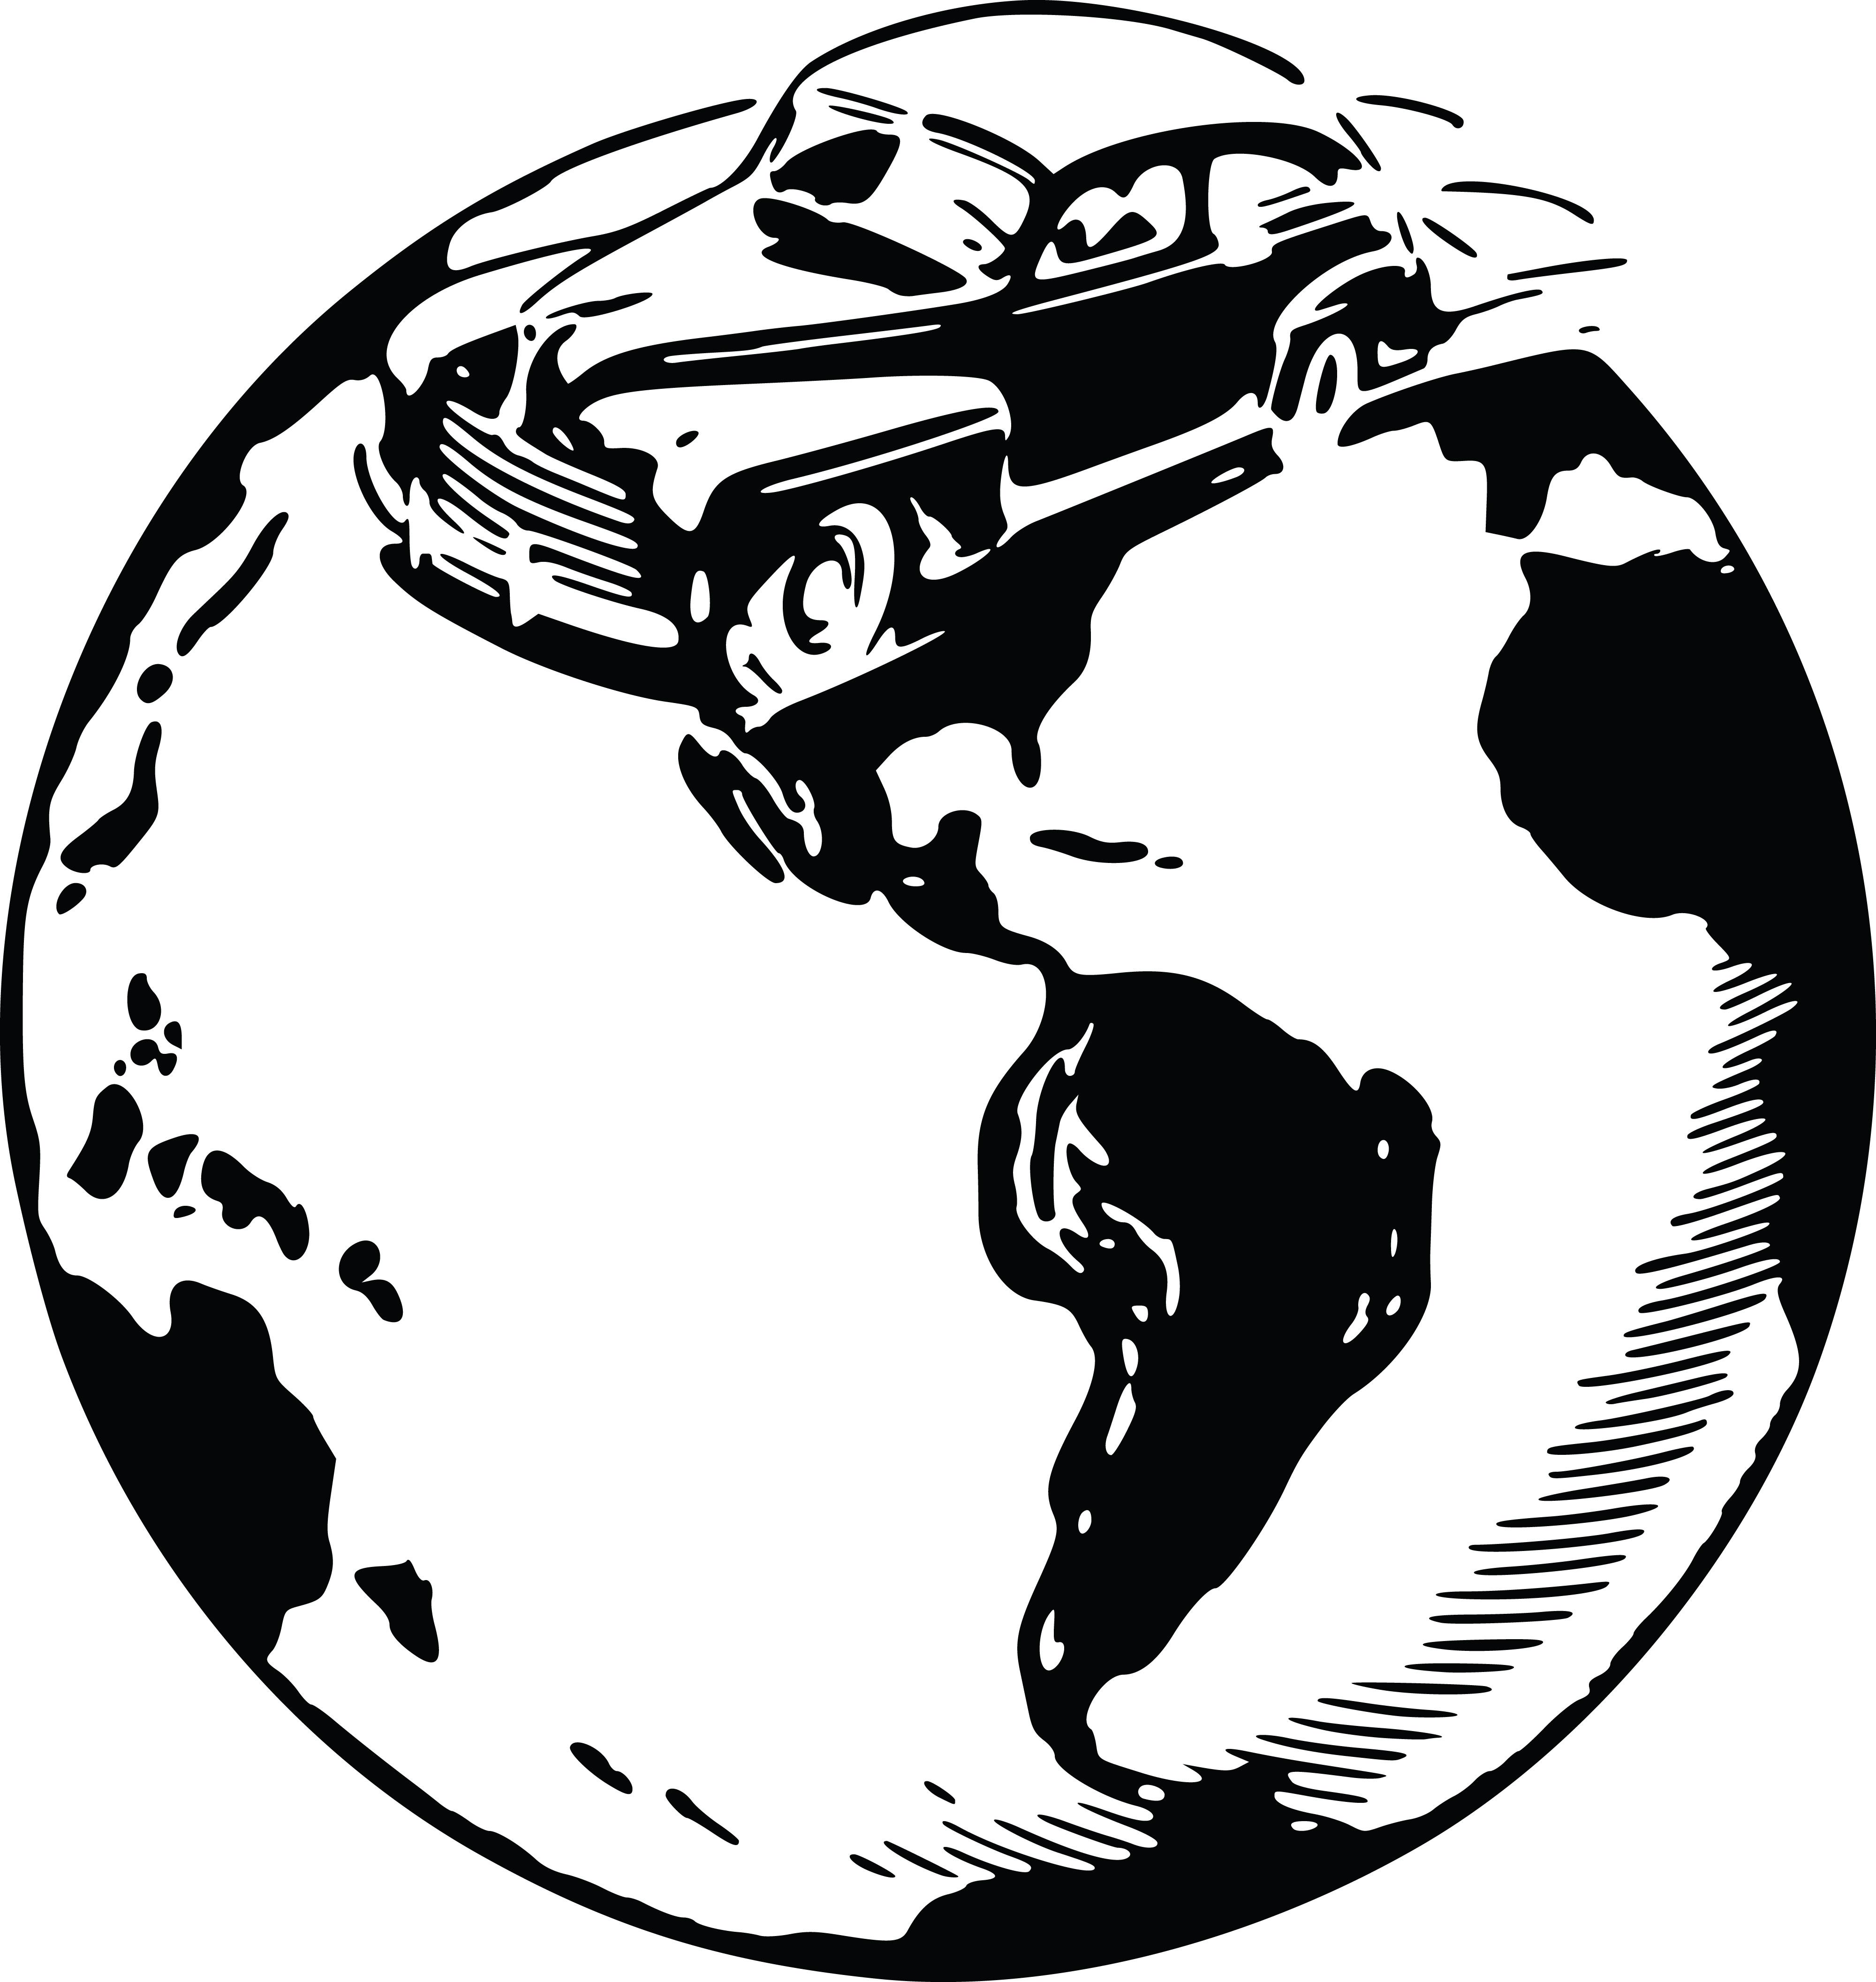 globe clipart cdr - photo #27